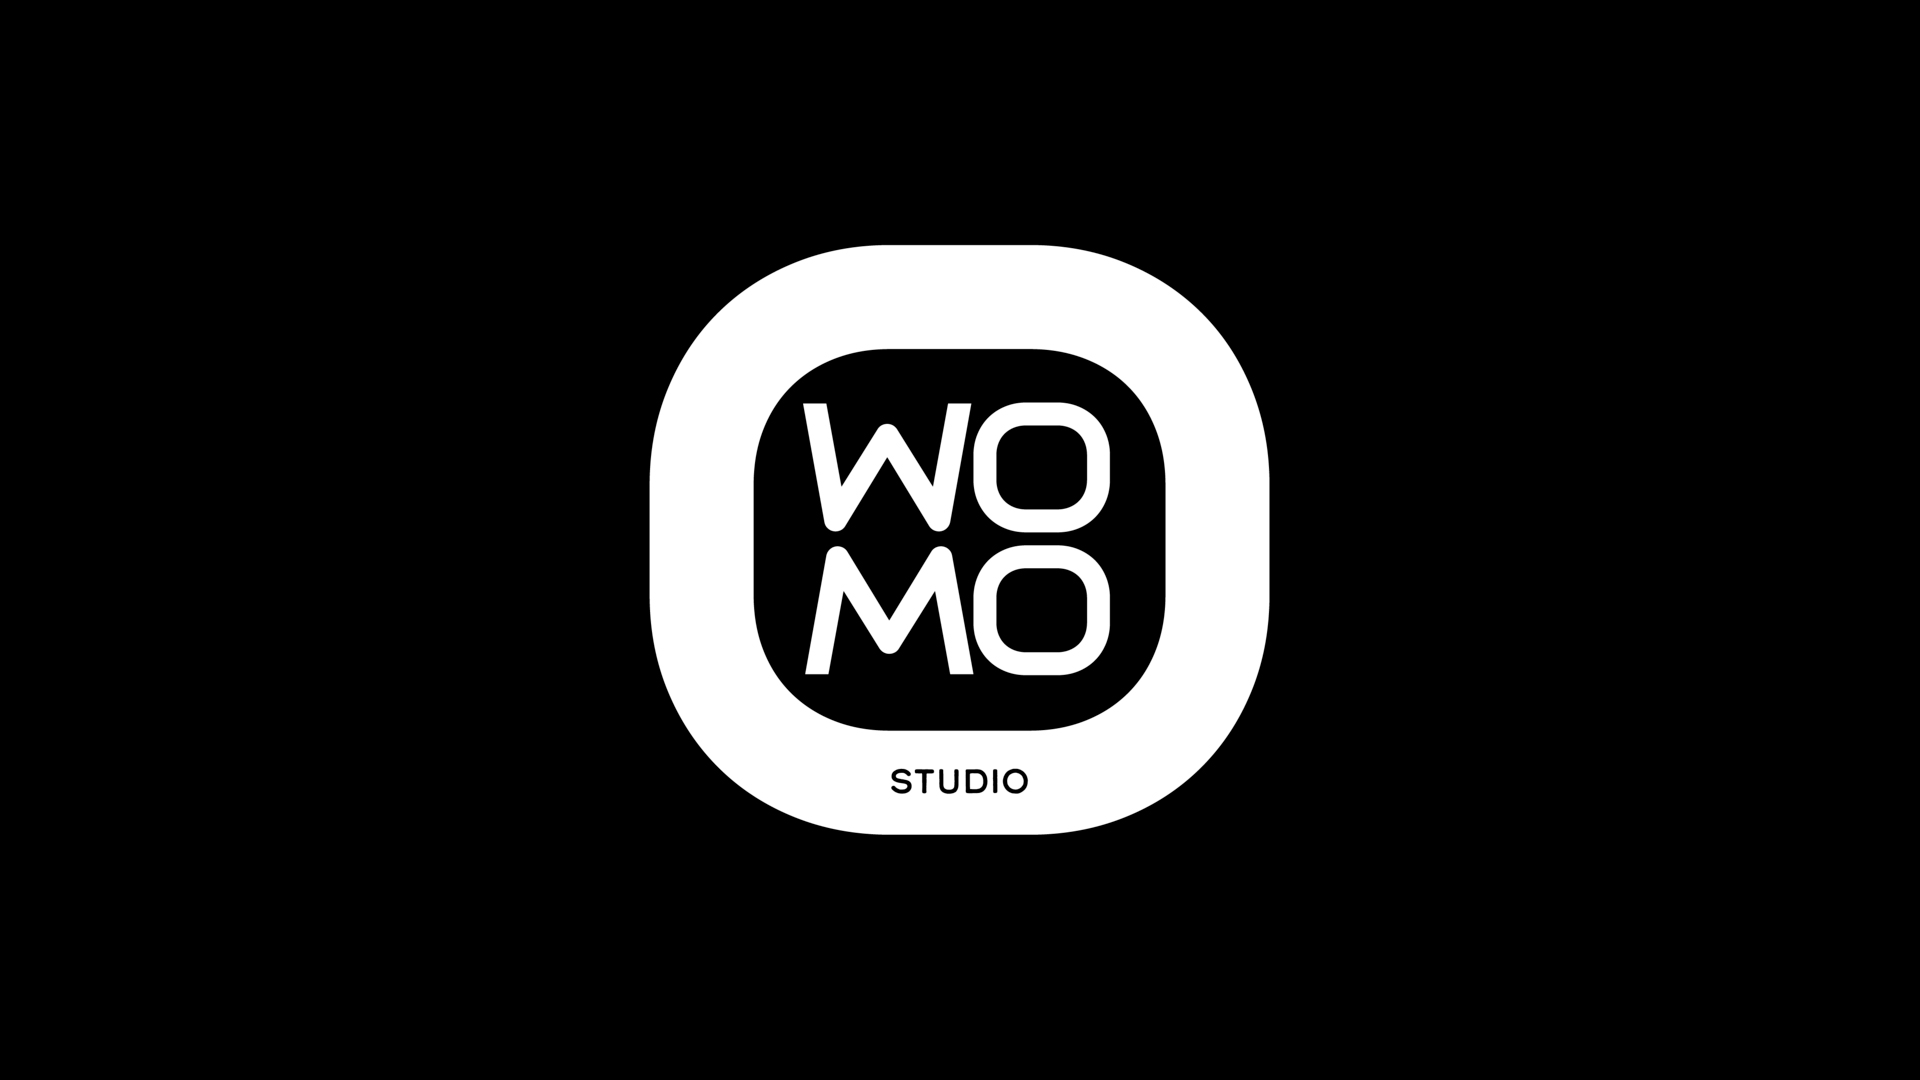 Logo for Womo Studio